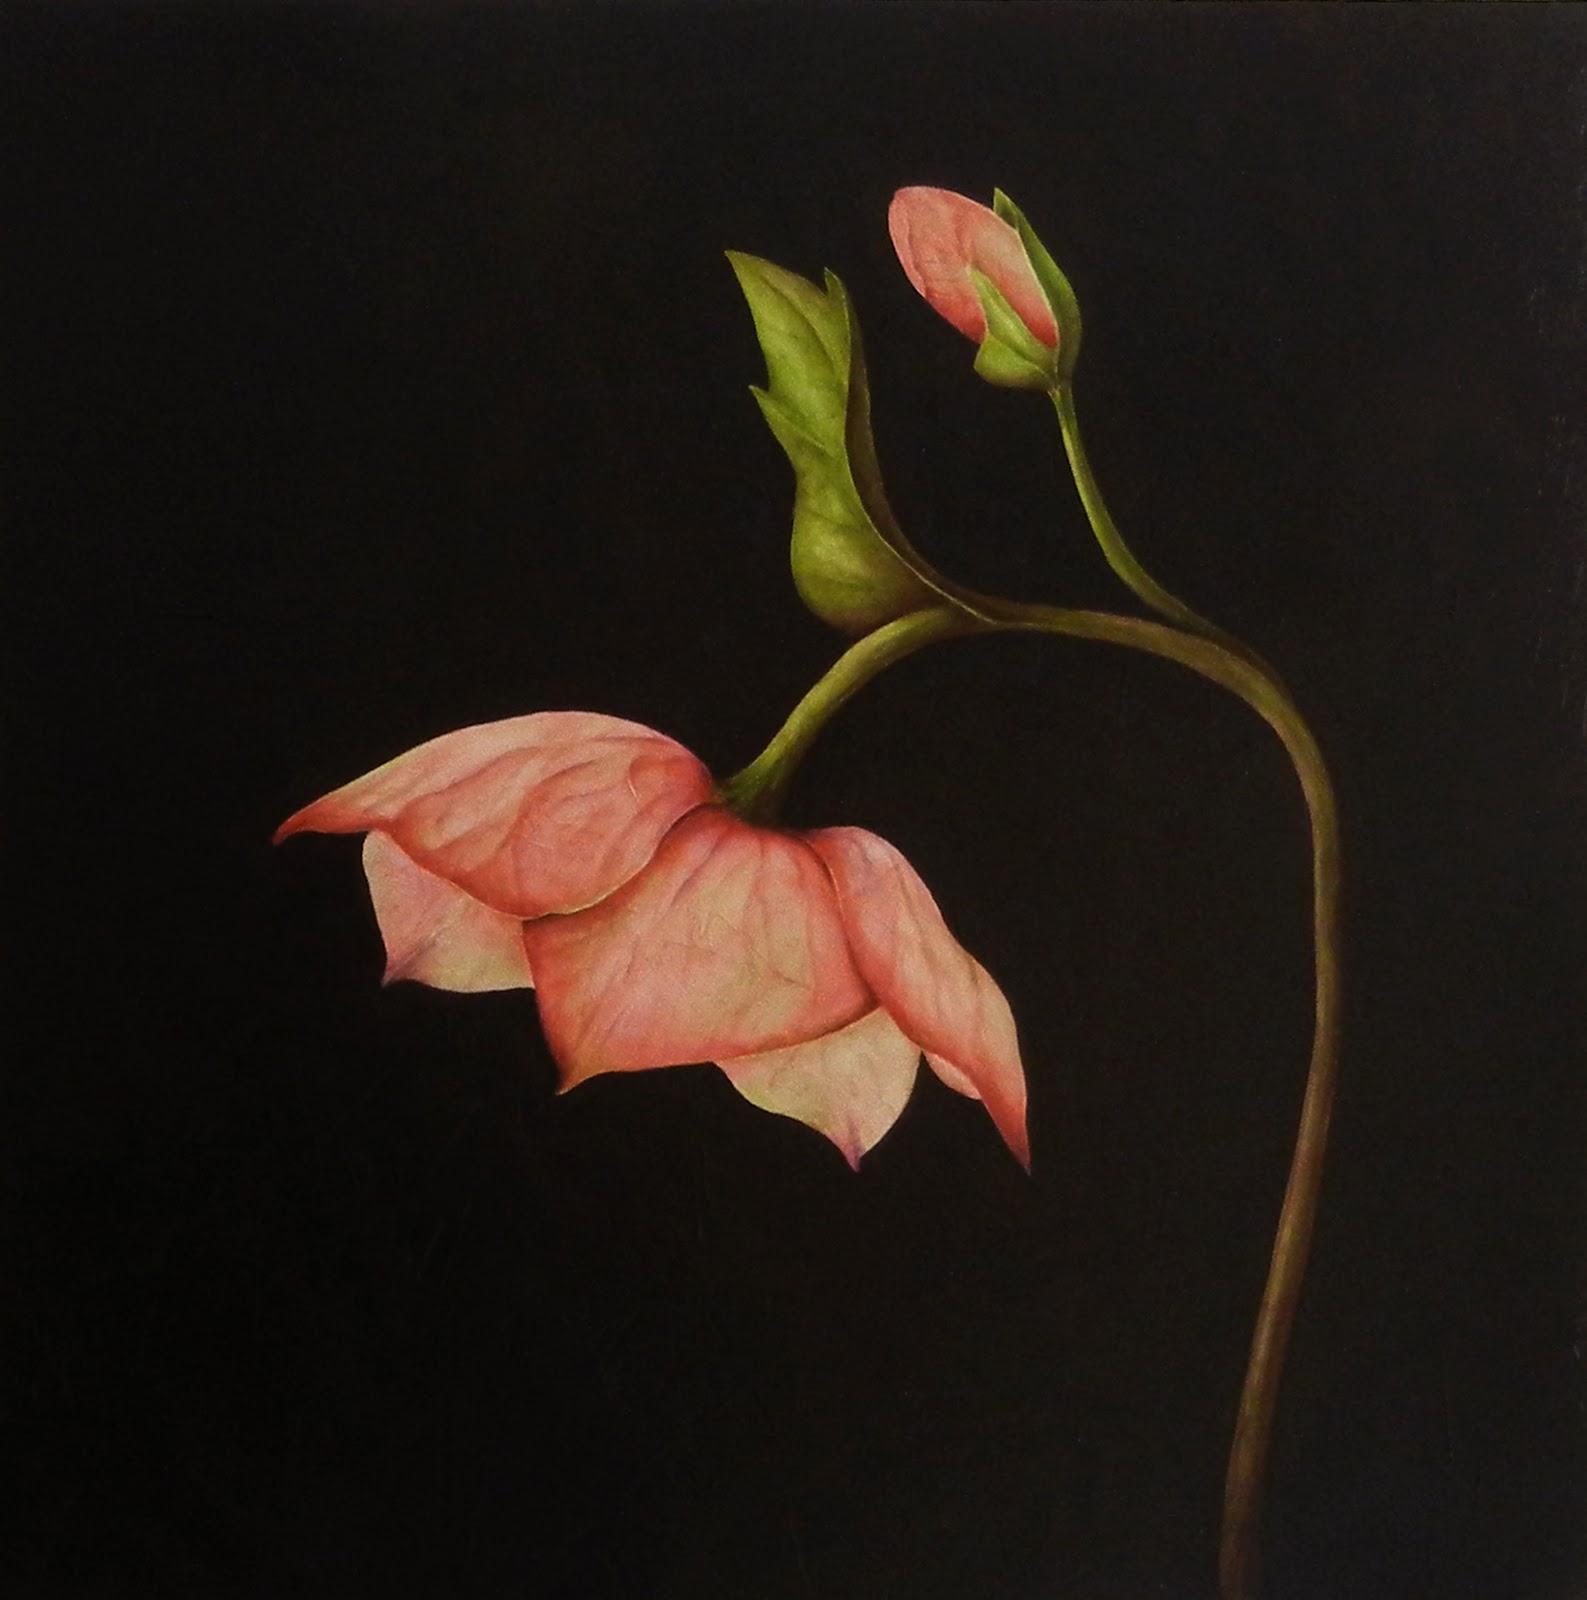 Beyond Words: the Symbolic Language of Plants: Eva-Maria Ruhl - photo#43